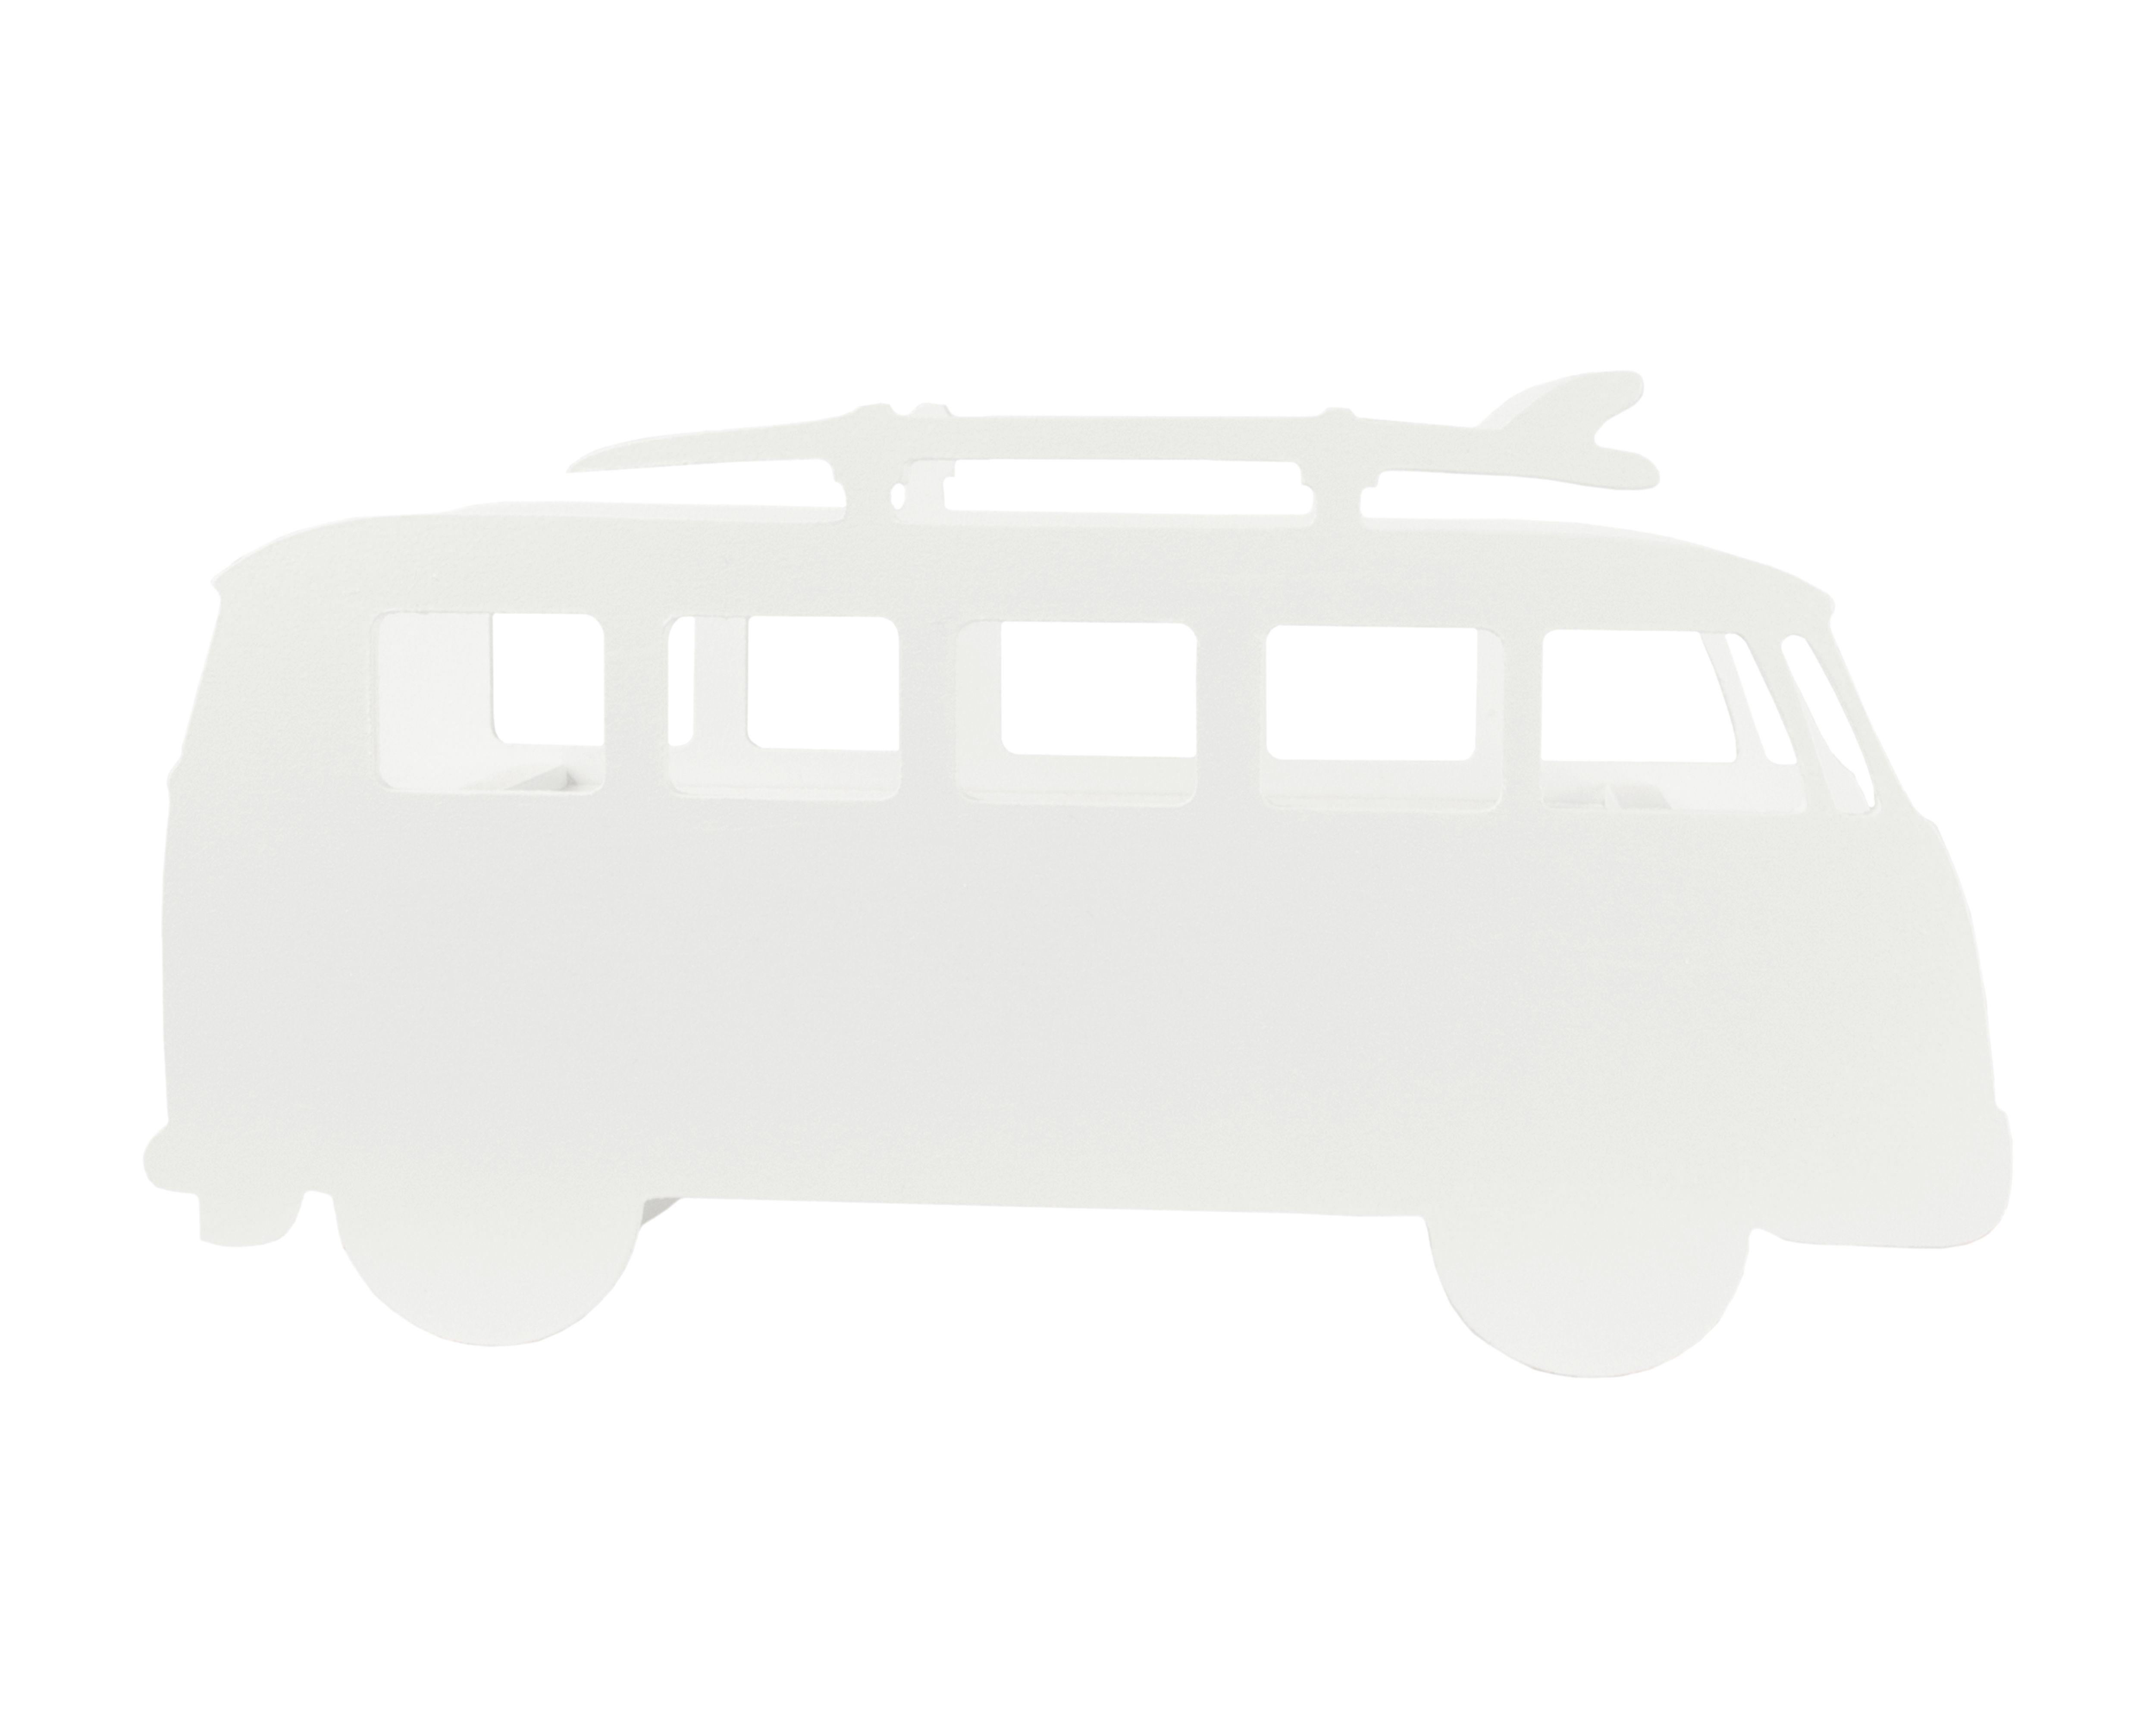 Lamp Kinderkamer Wit : Lamp surfersbusje wit lamp kinderkamer jongenskamers